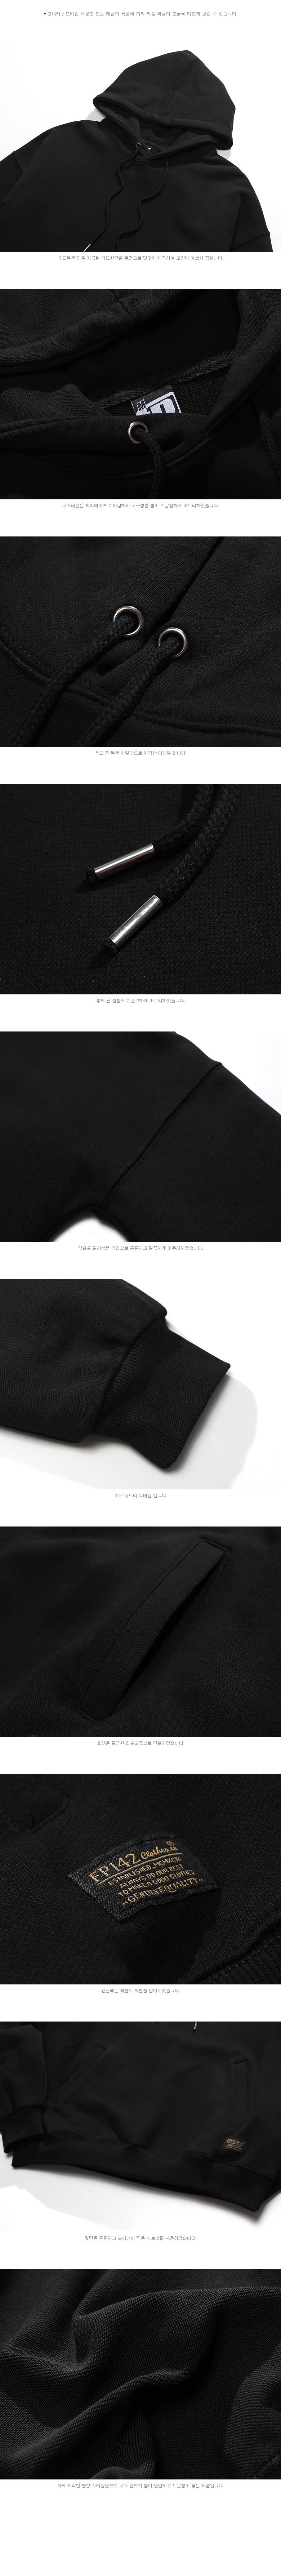 2_KHHD1189_detail_black_free_02.jpg